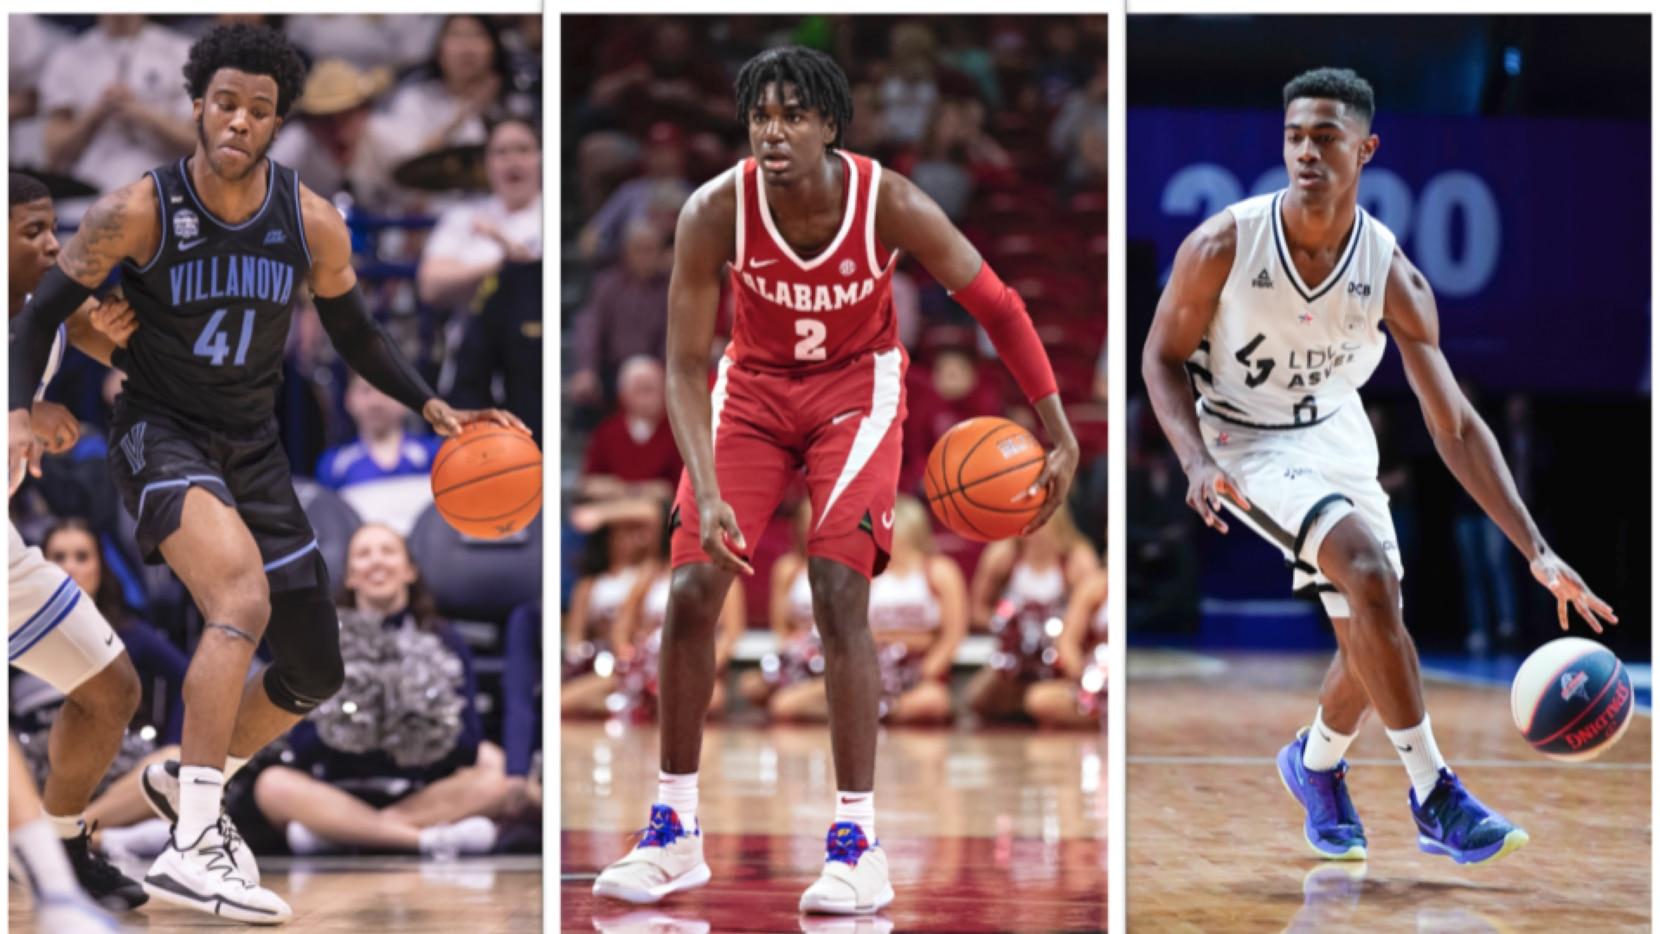 Los jugadores colegiales Kira Lewis Jr. (Alabama), Saddiq Bey (Villanova) y  Theo Maledon (ASVEL Basket).